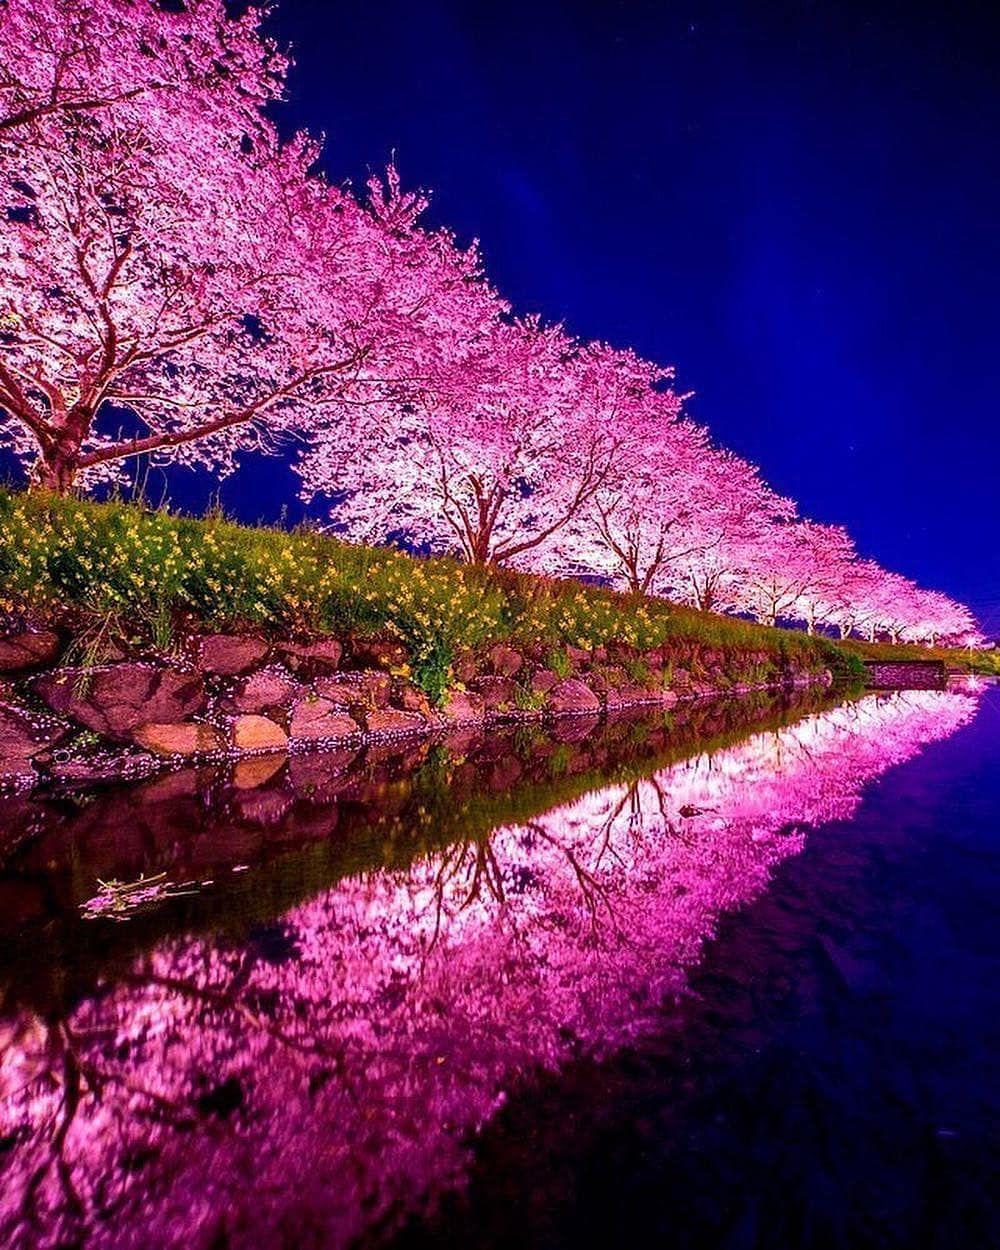 Travlel Journyy On Instagram Cherry Blossom Season In Japan Traveljournyy Tag Someone By Puraten10 Japan Beautiful Nature Instagram Nature Photography